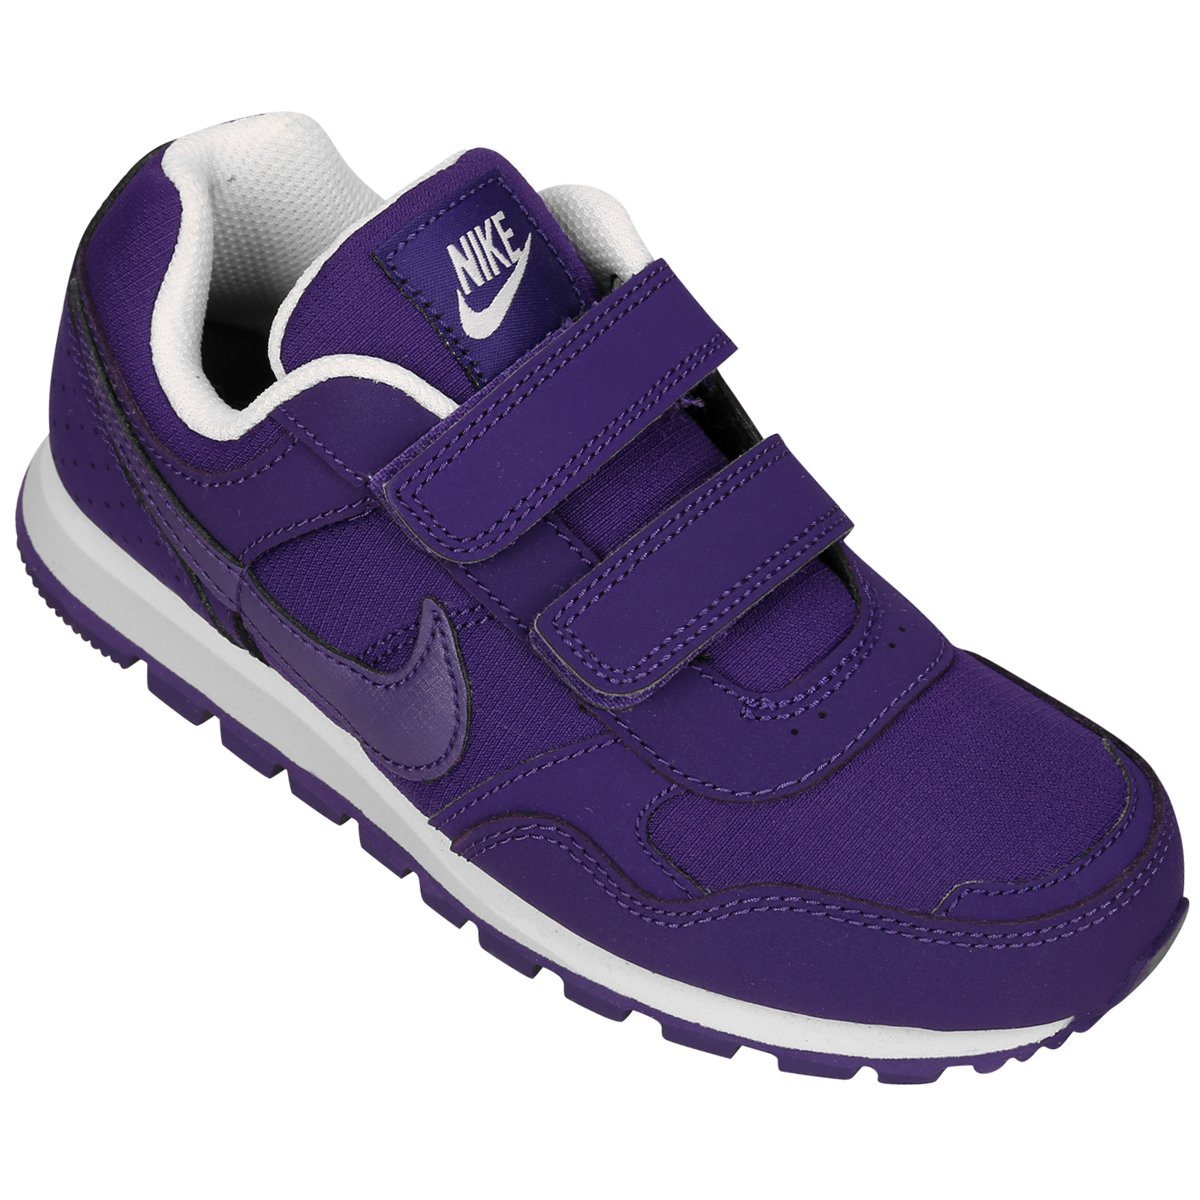 7e03563f889 Tênis Nike Md Runner Infantil - Compre Agora